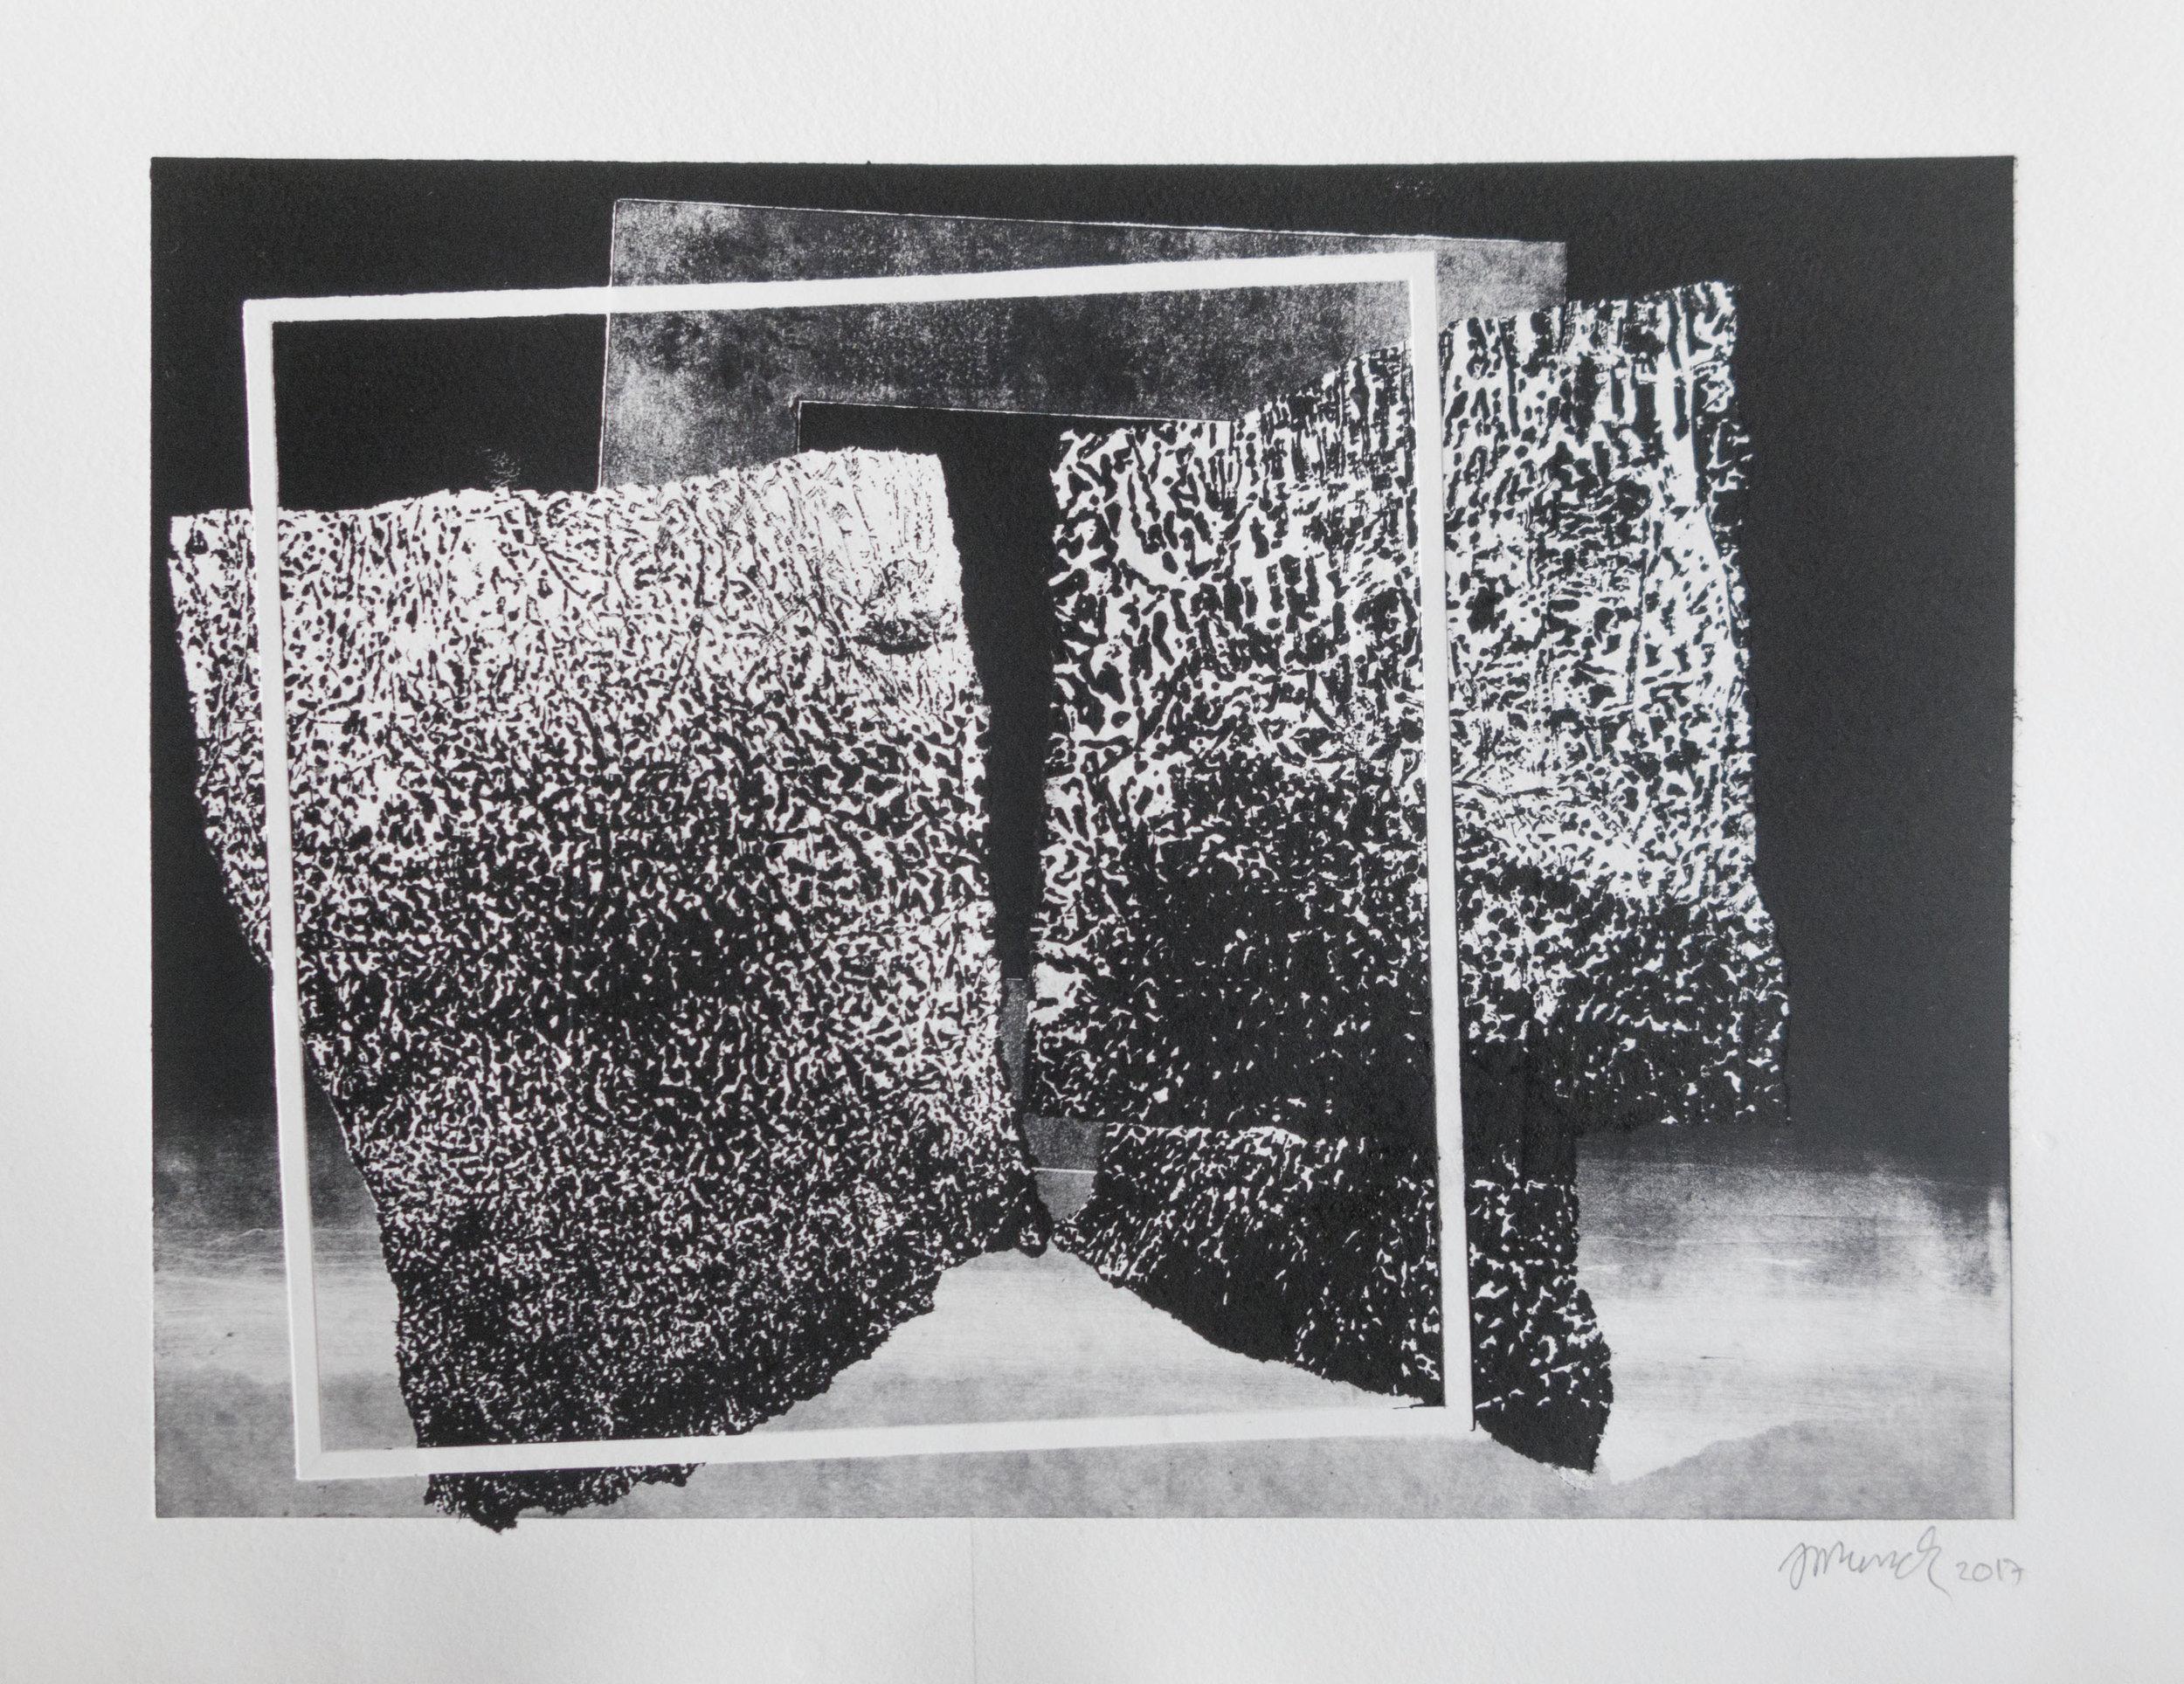 Forms on black 20 (32cm x 26 cm)